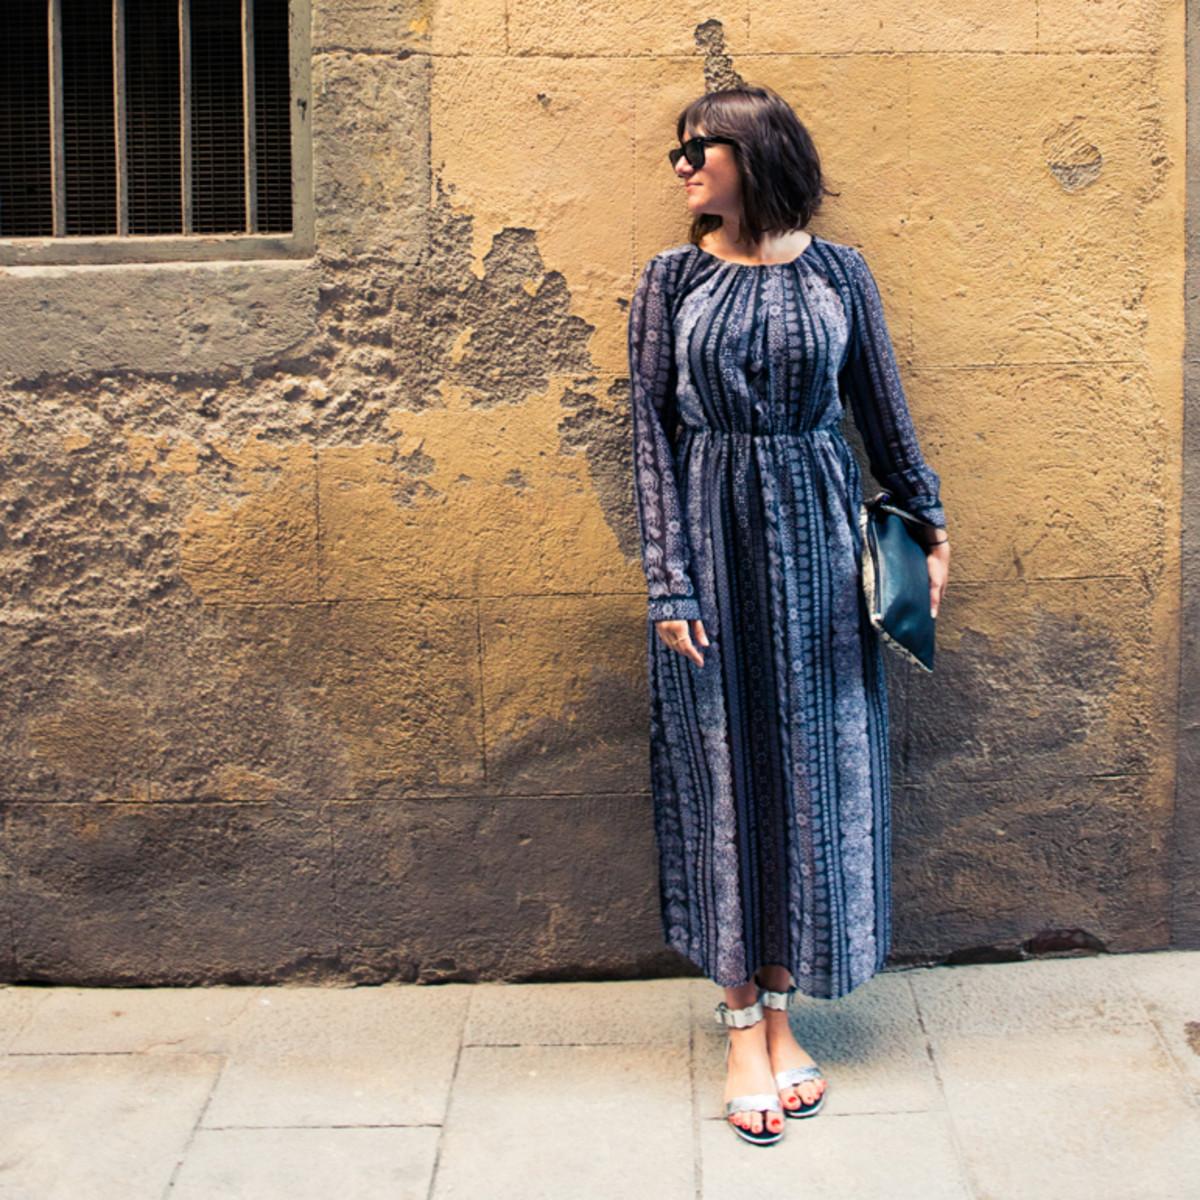 Footwear designer Isa Tapia in Barcelona in 2014 with W Hotels. Photo: W Hotels